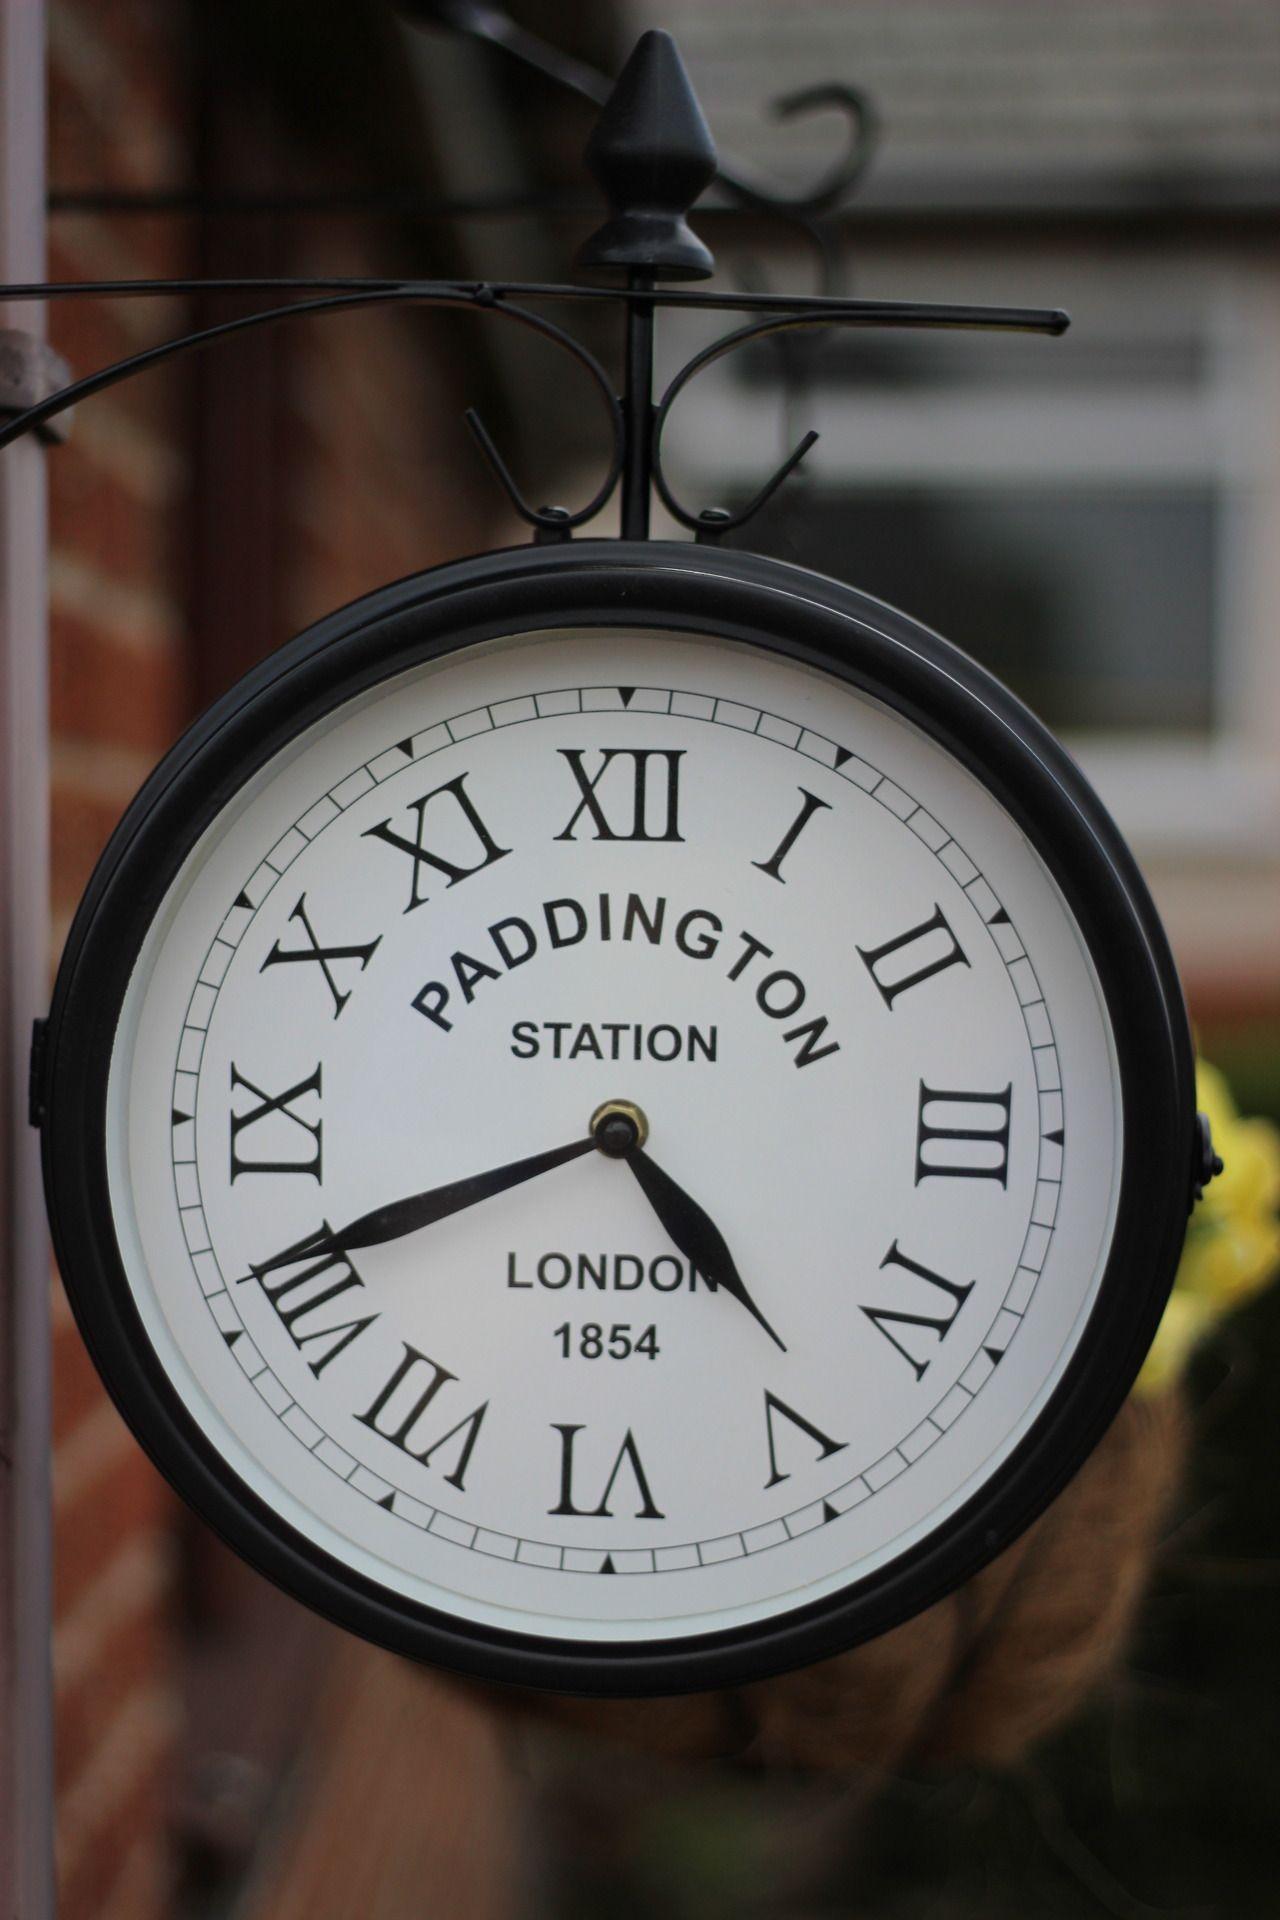 Paddington Station (London) Garden Clock